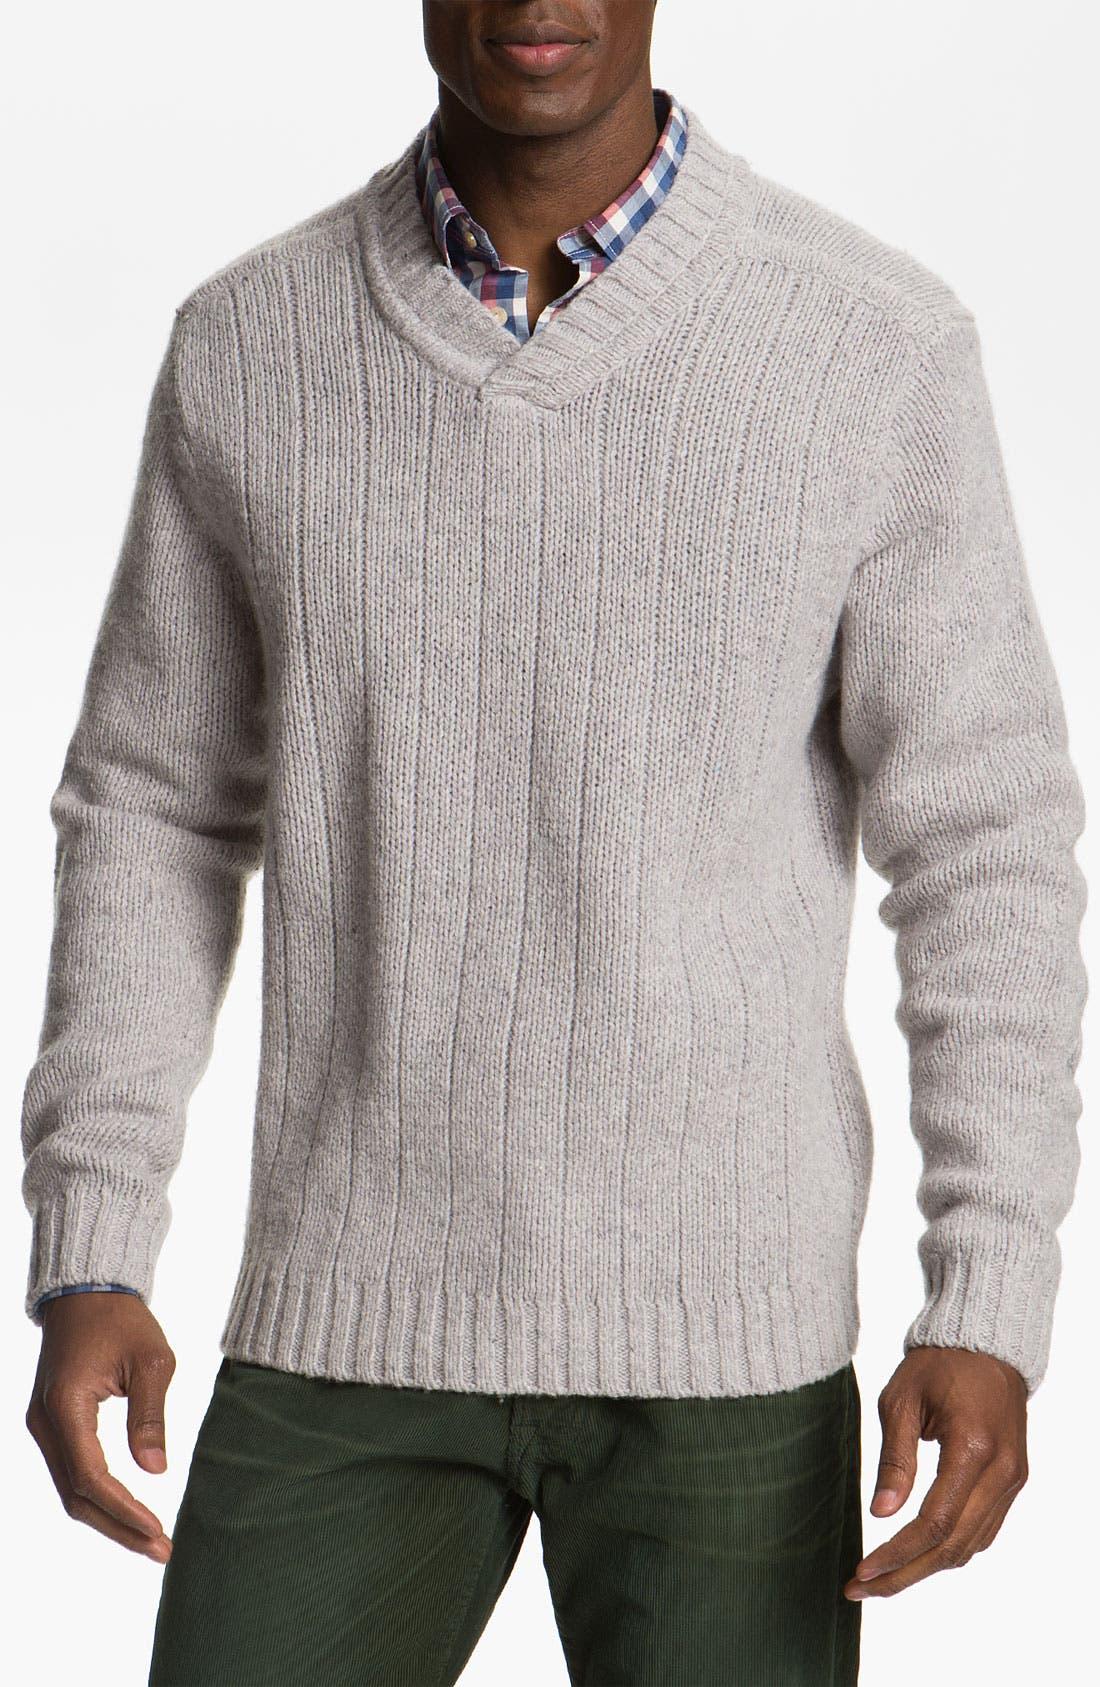 Alternate Image 1 Selected - Cutter & Buck 'Northlands' V-Neck Wool Blend Sweater